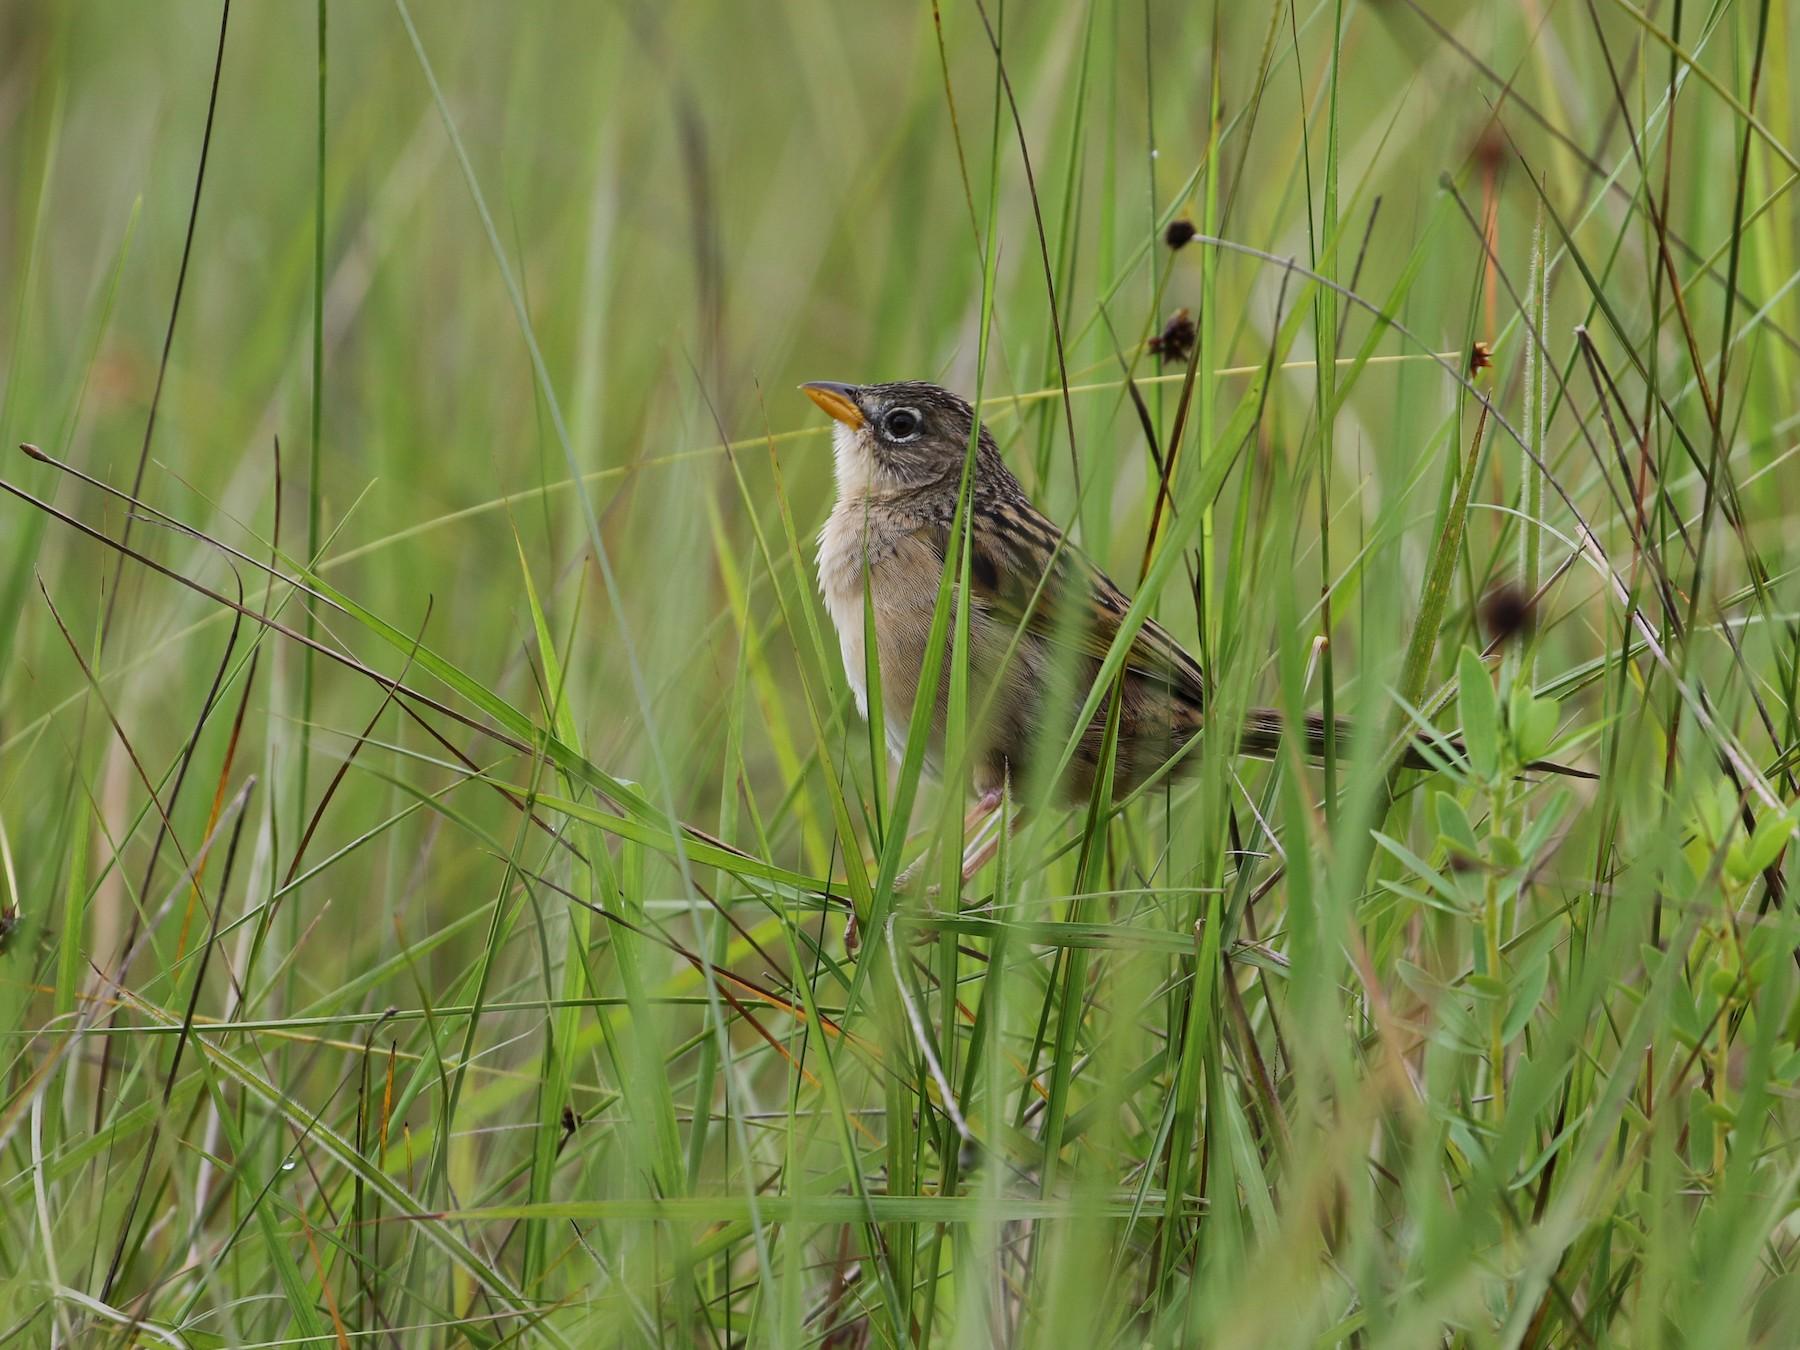 Wedge-tailed Grass-Finch - John van Dort